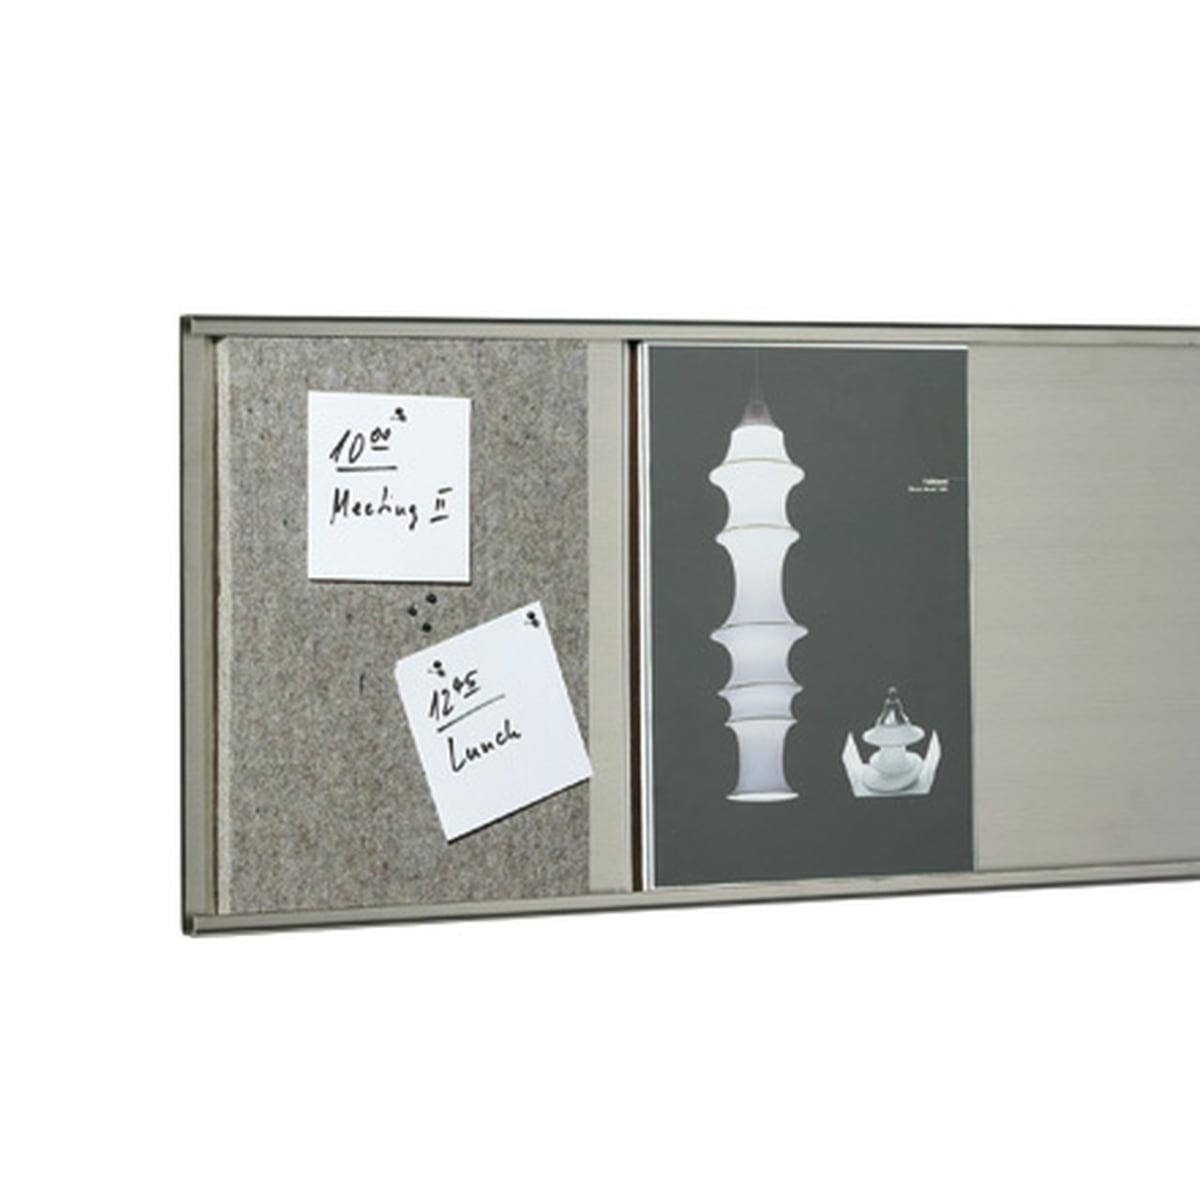 Klein & More - Pinnwand aus Filz und 6 Pins (DIN A4)   Büro   Grau   Filz   Klein & More